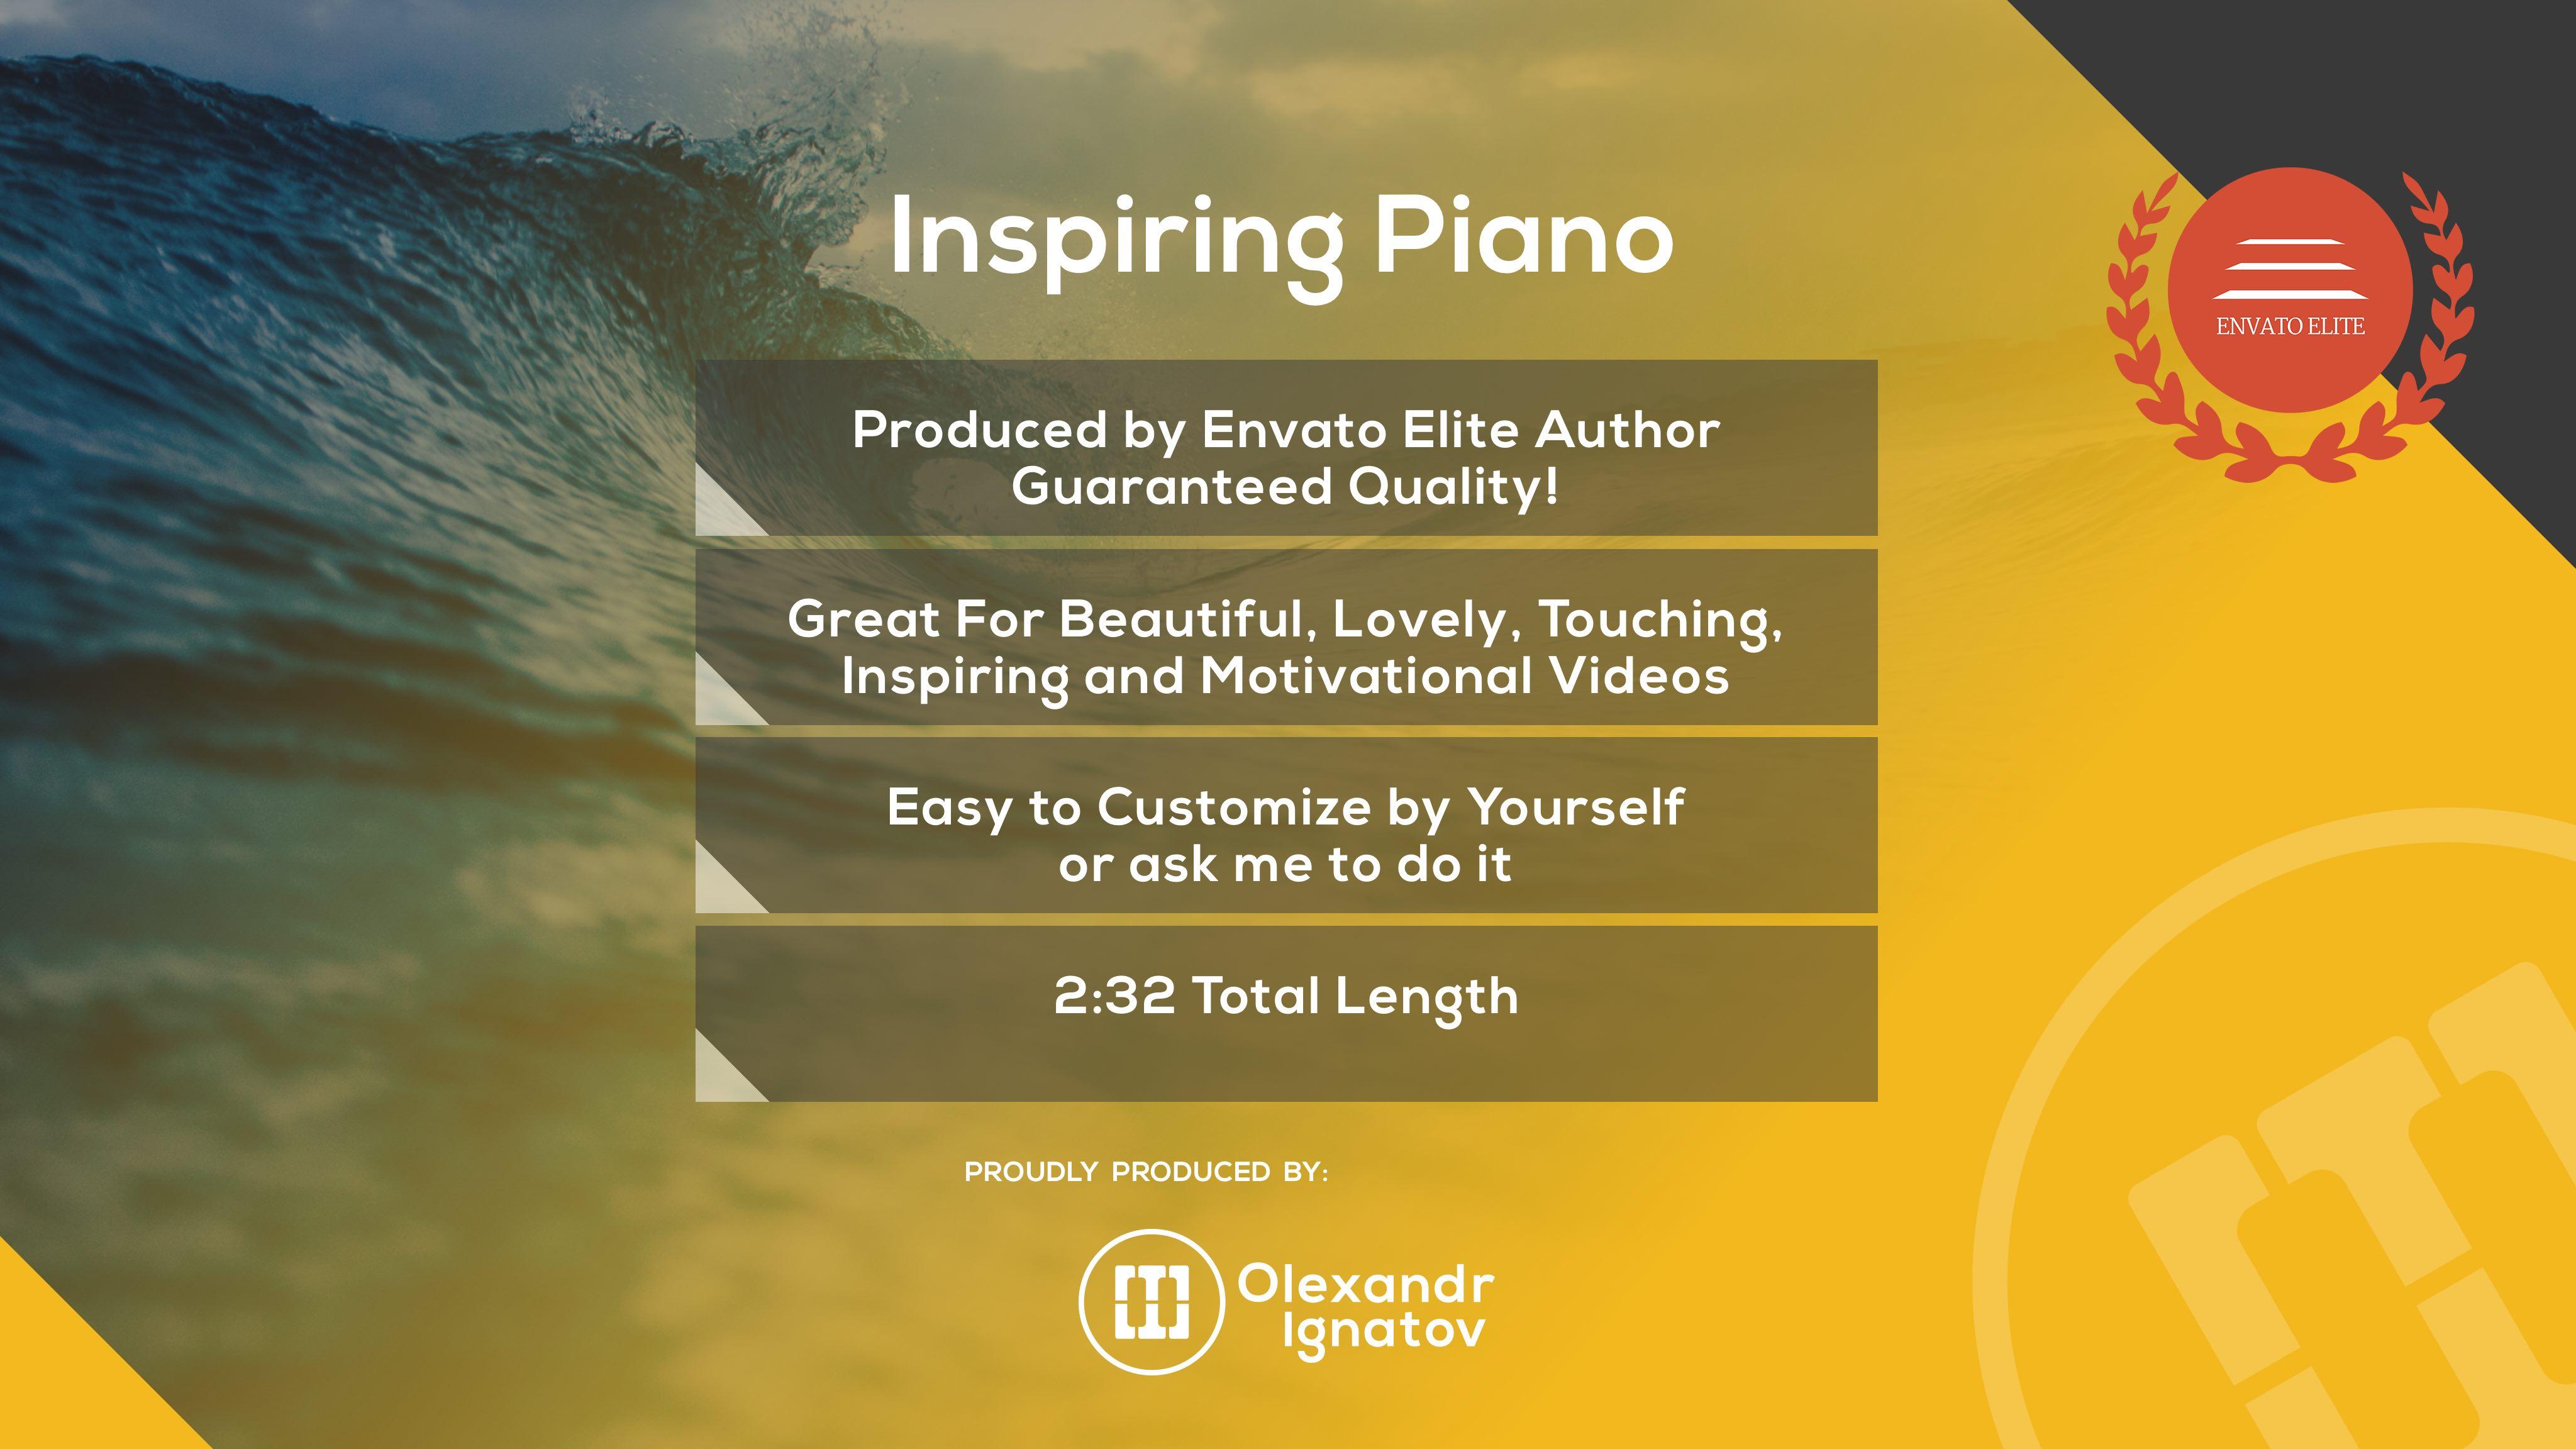 Emotional Cinematic Inspiring Piano - 4